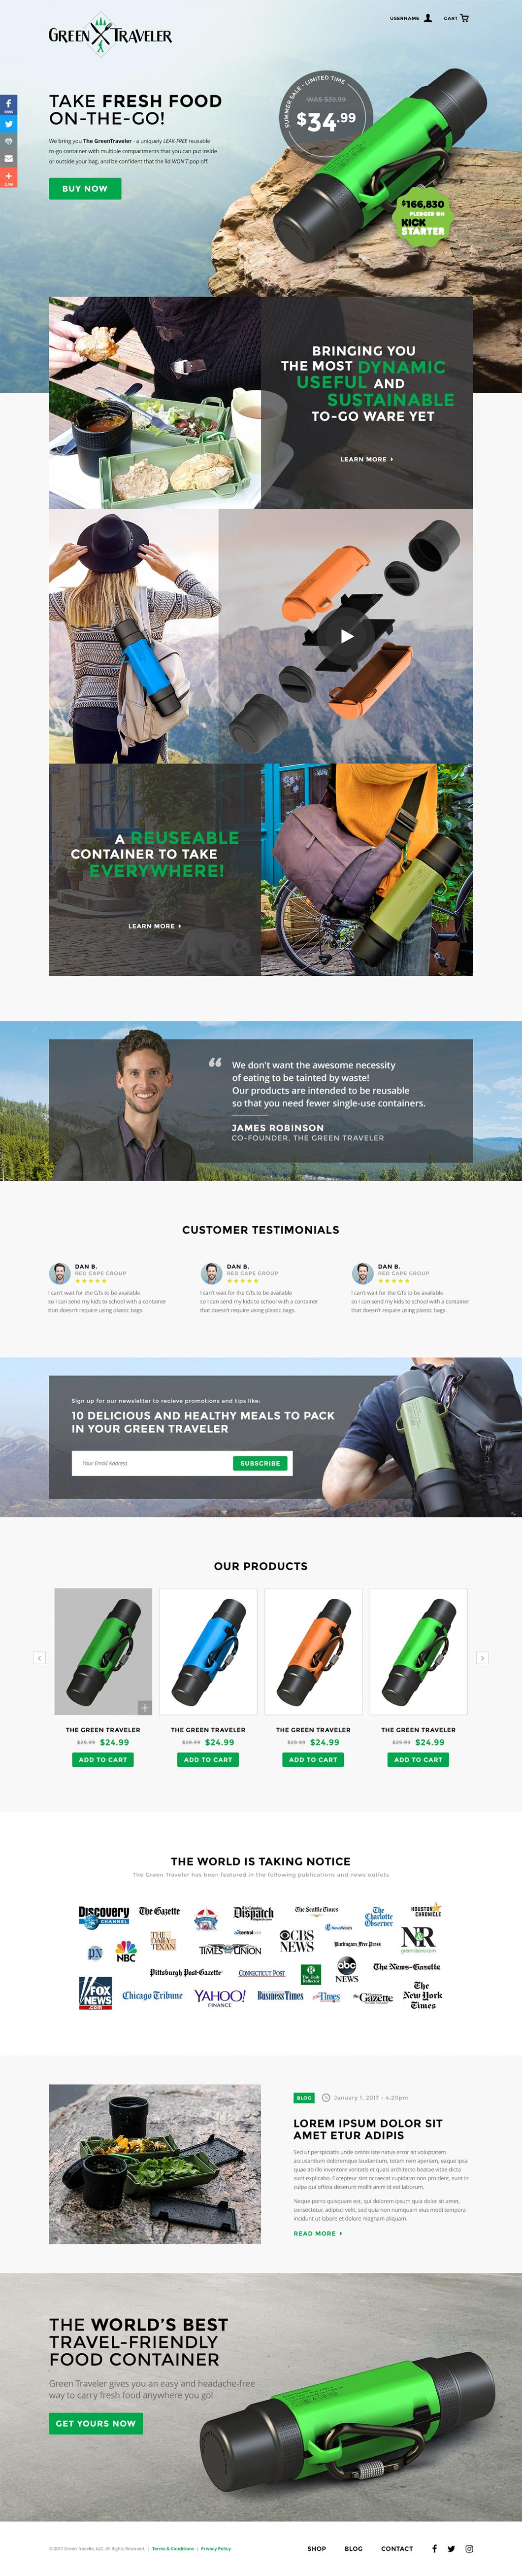 Green Traveler Homepage